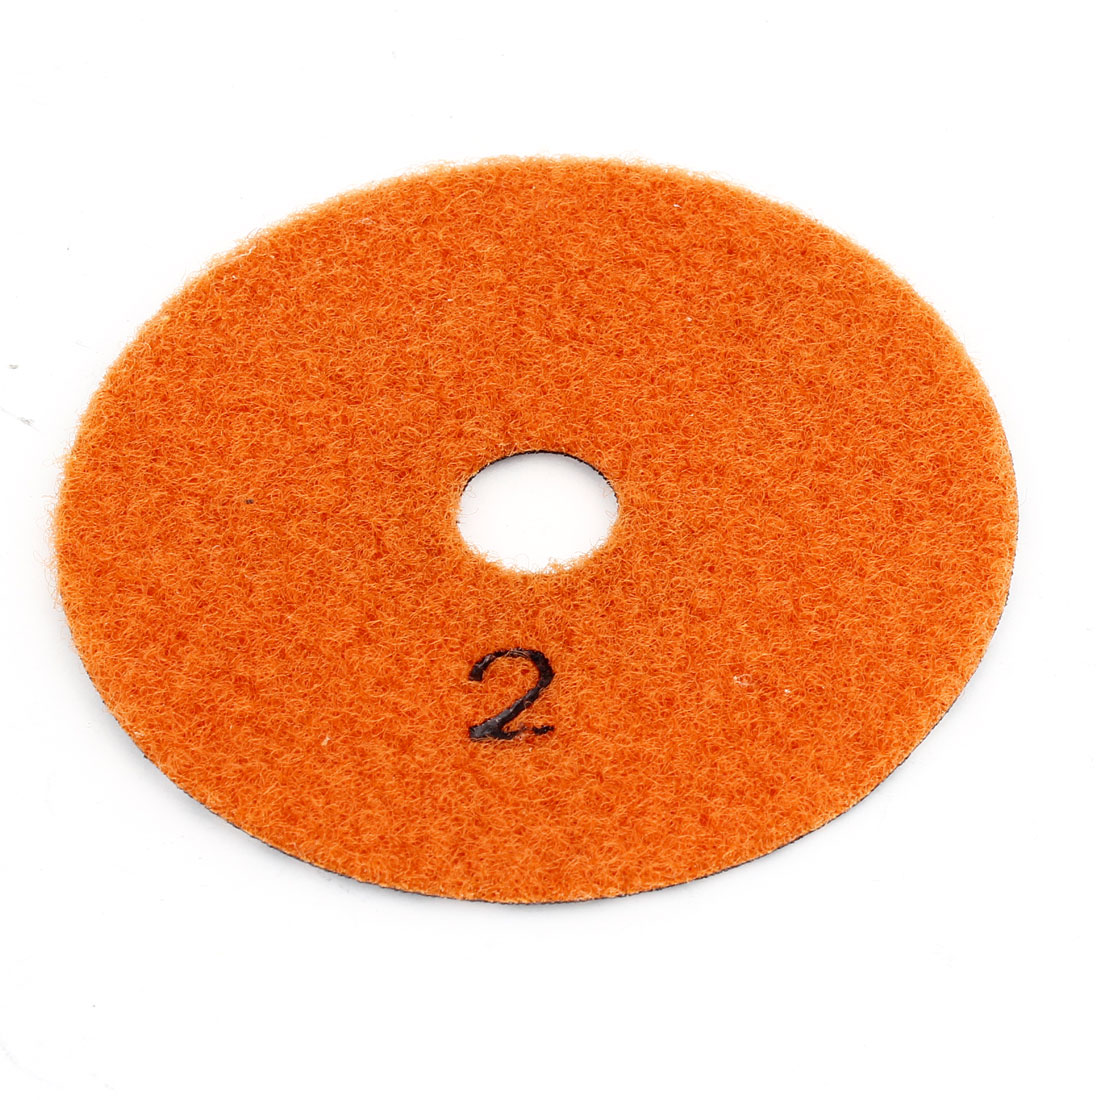 Pink Orange Disc Shaped Wet Dry Diamond Polishing Pad 10cm Dia